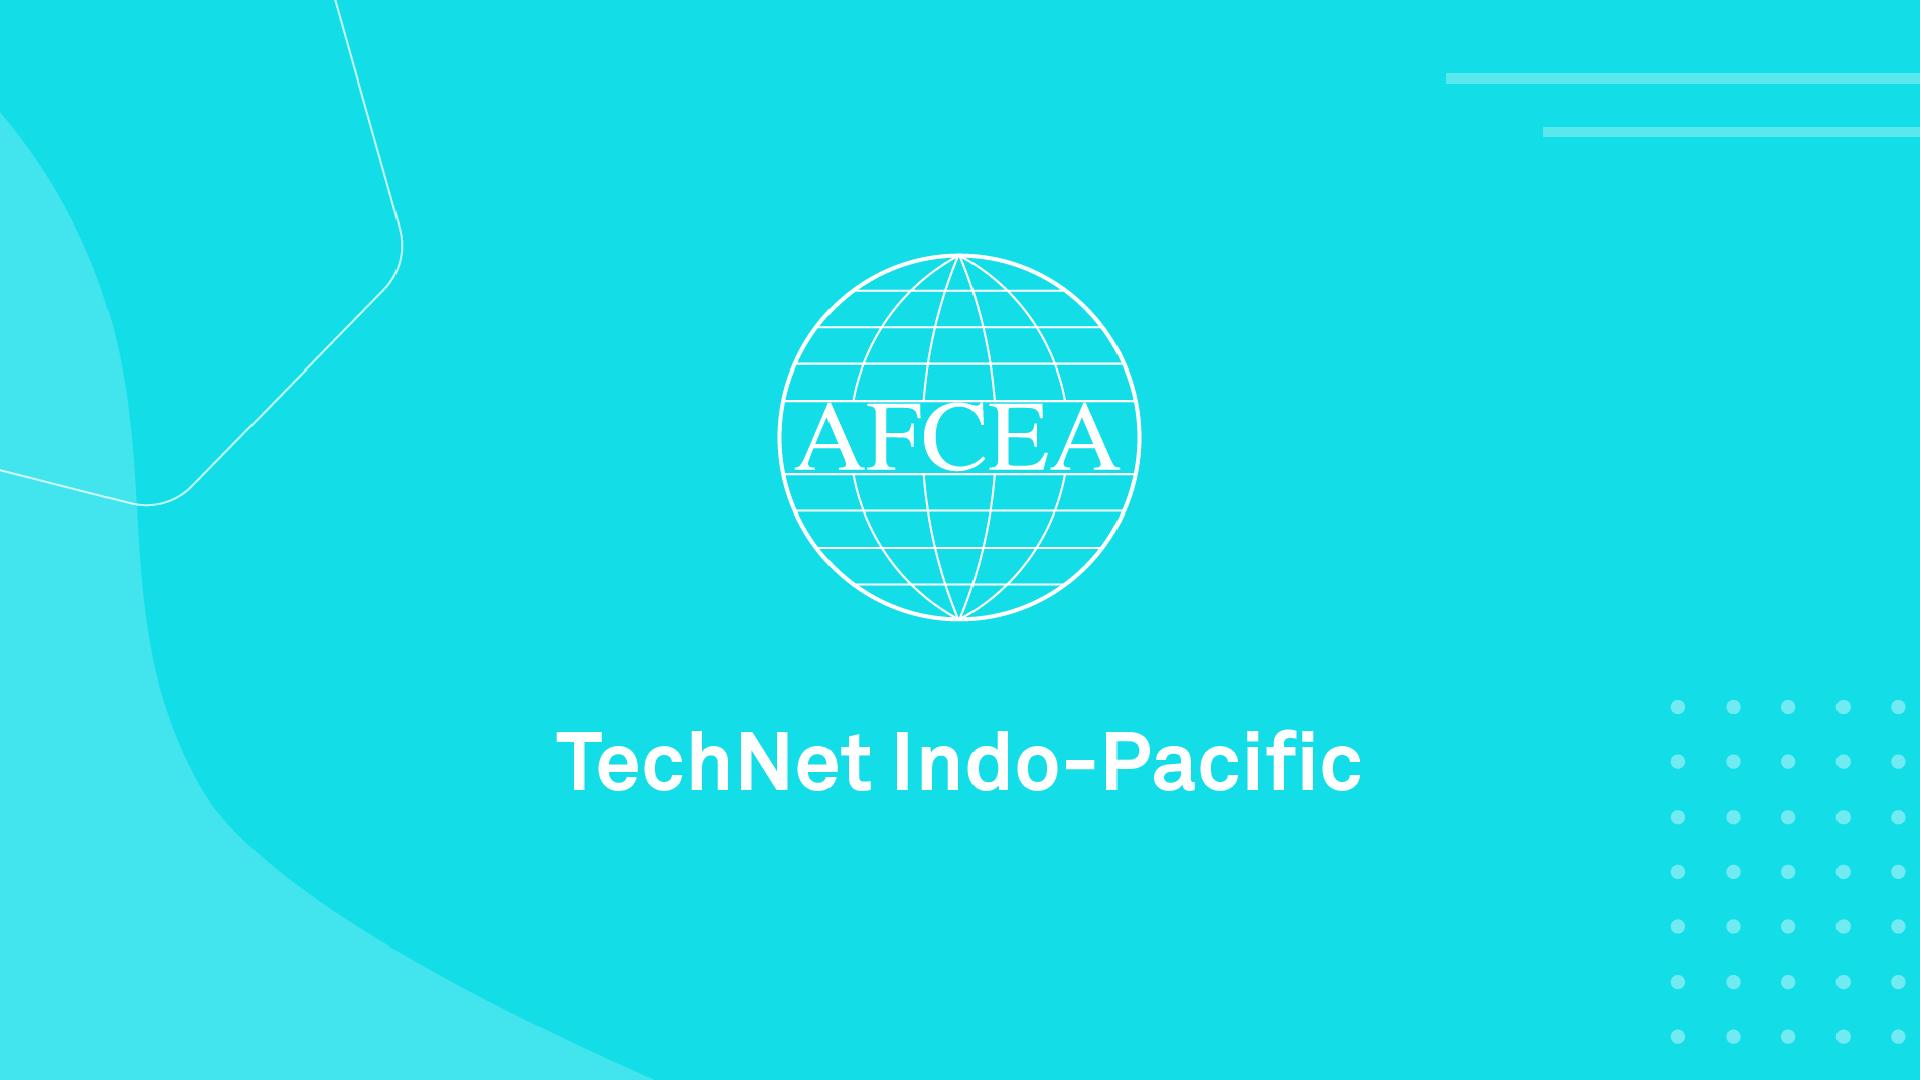 TechNet Indo-Pacific 2021